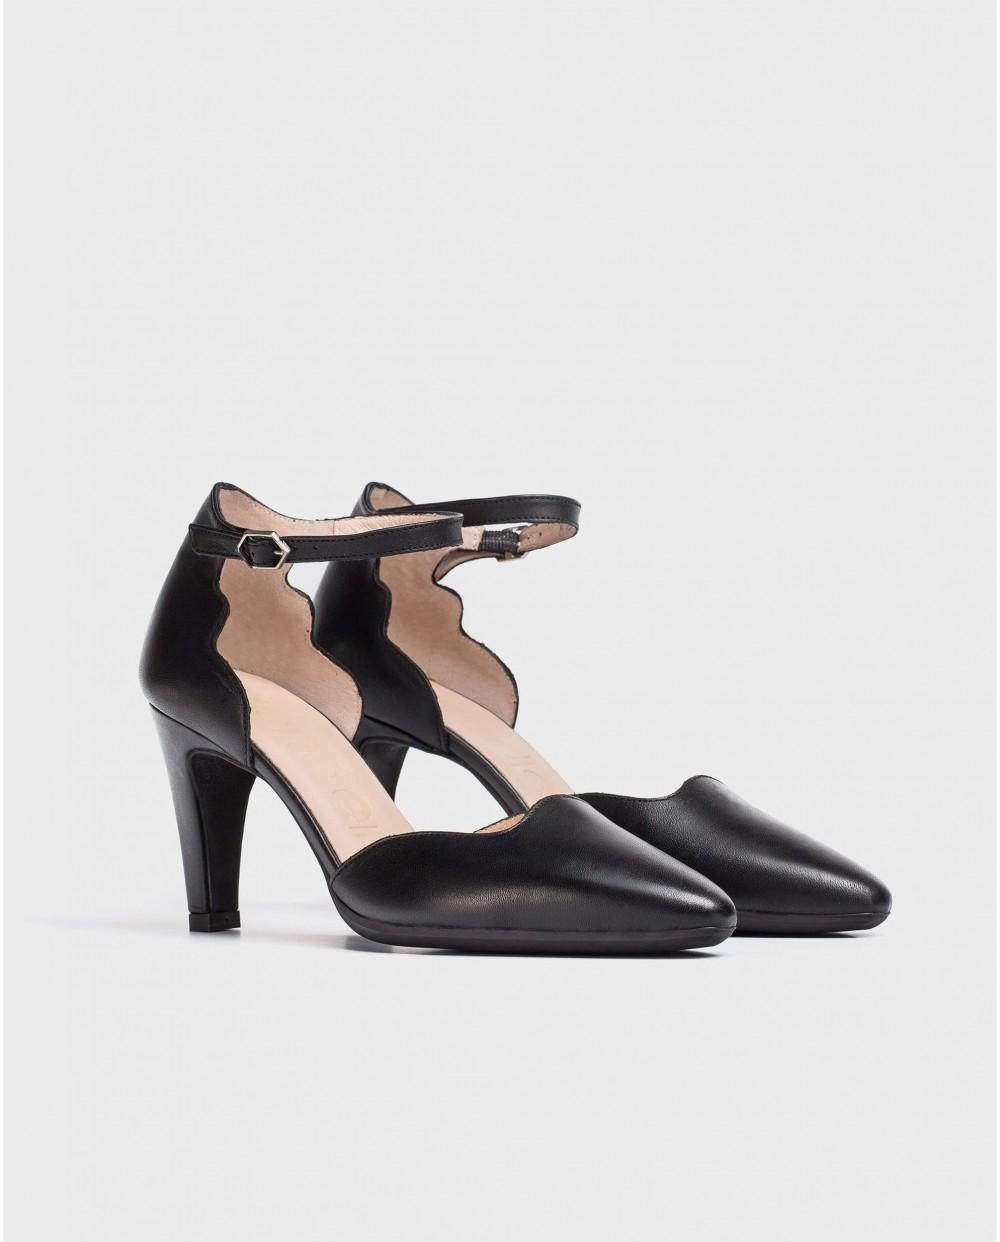 Wonders-Outlet-High heeled wave shoe